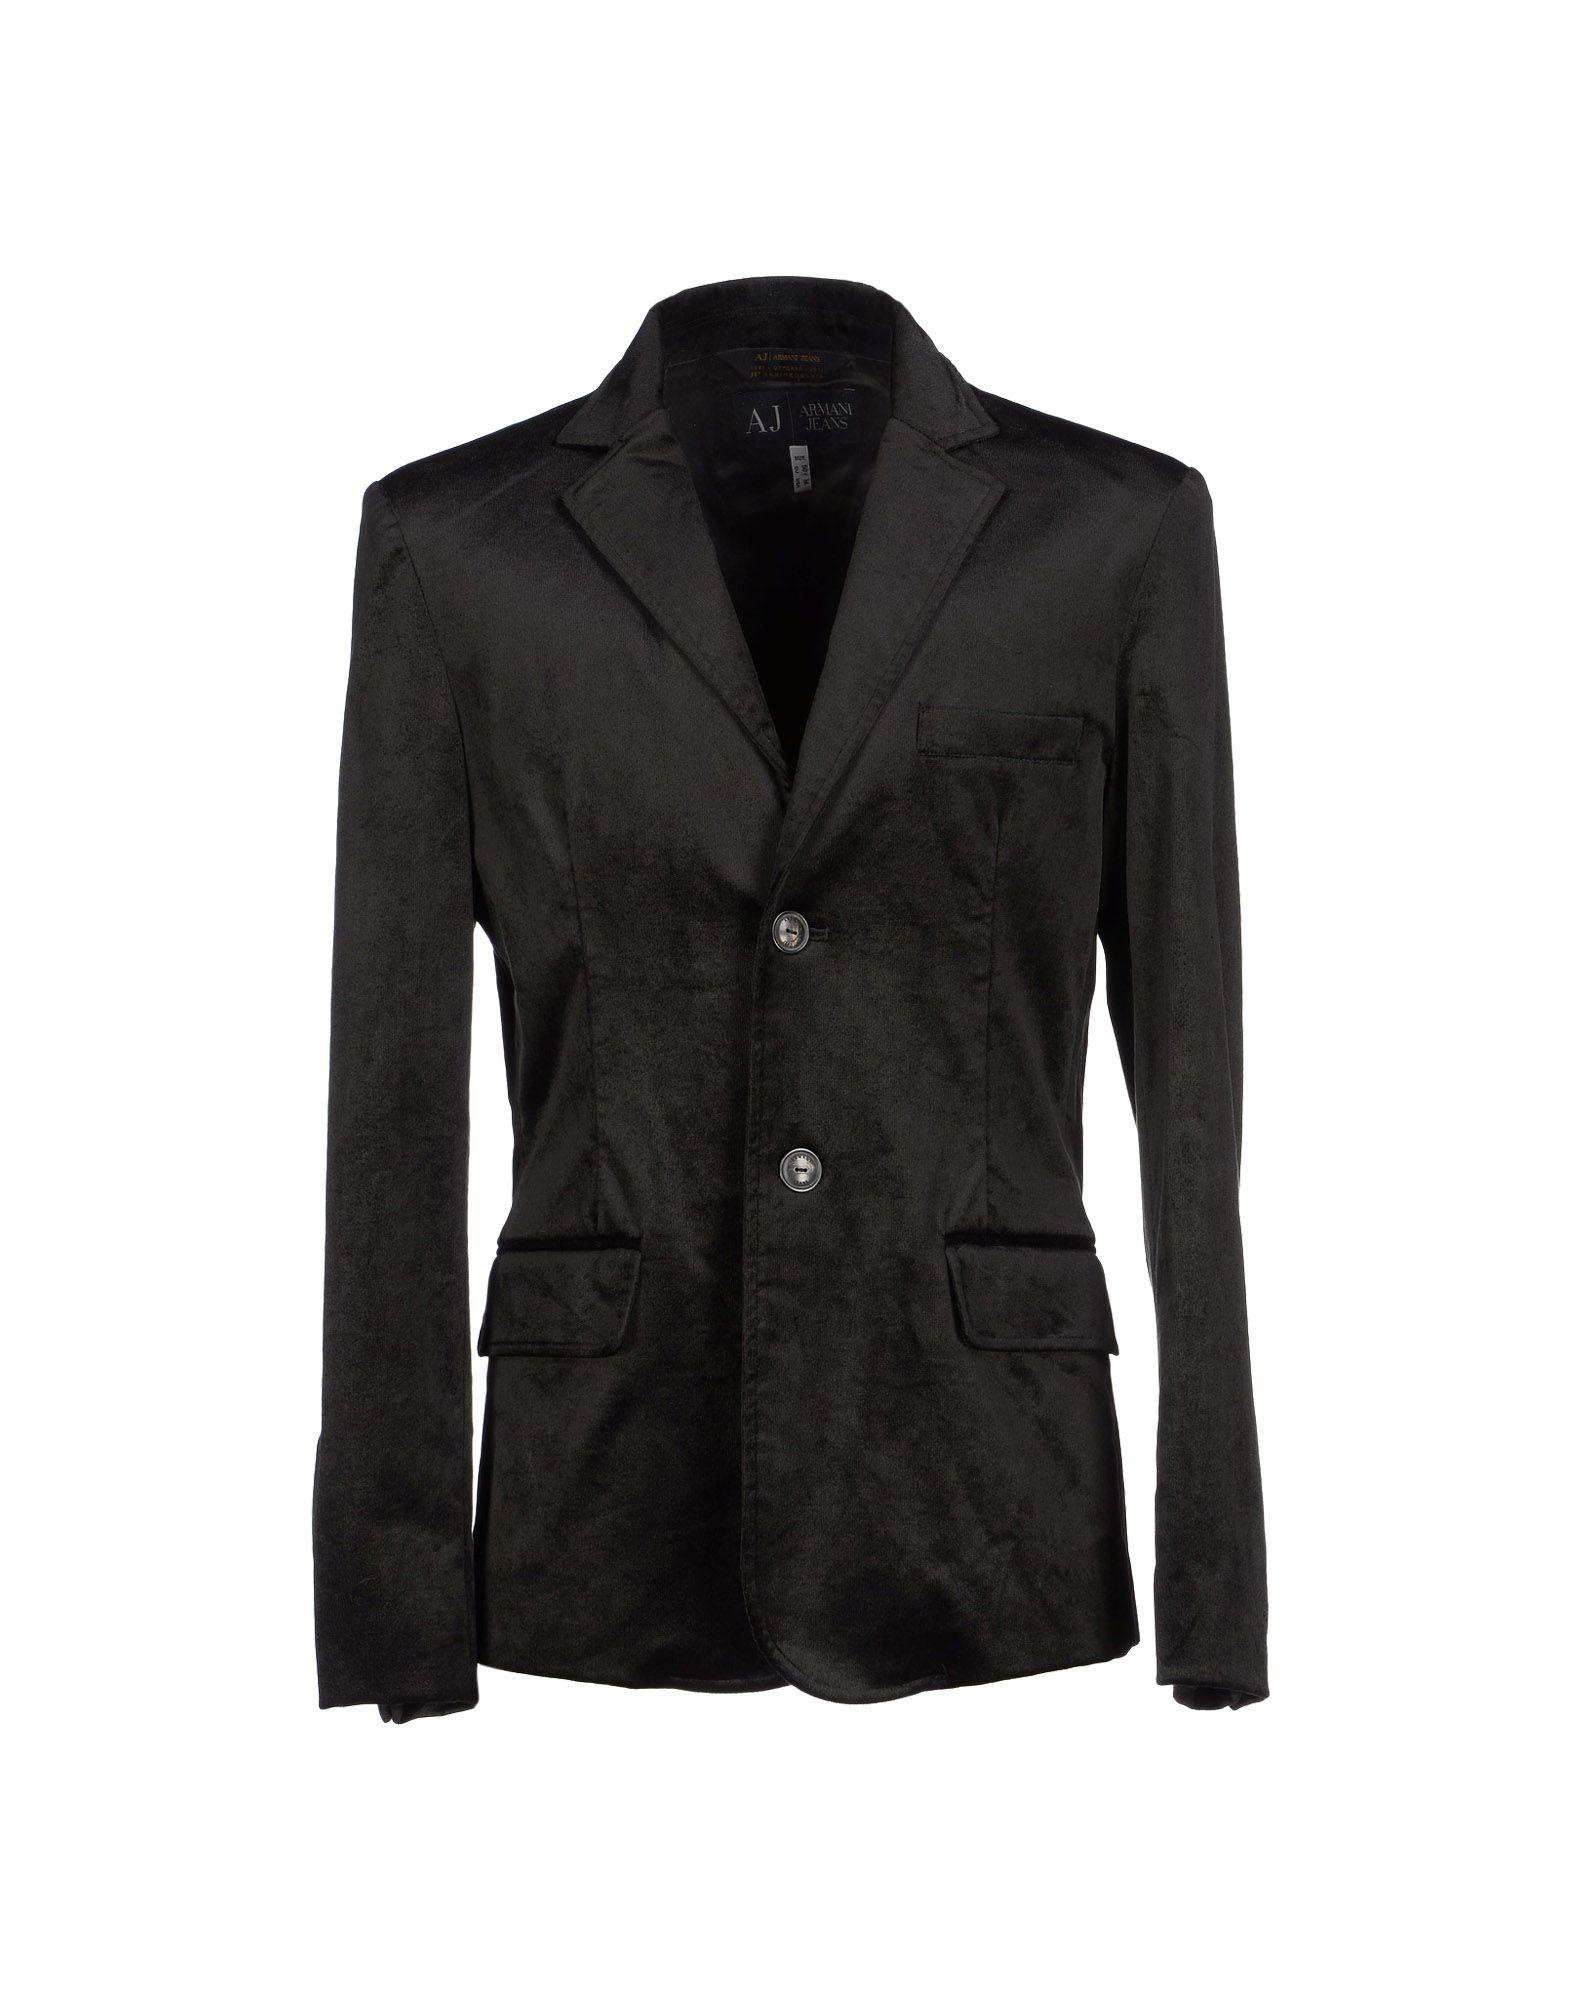 Armani jeans Blazer in Black for Men | Lyst